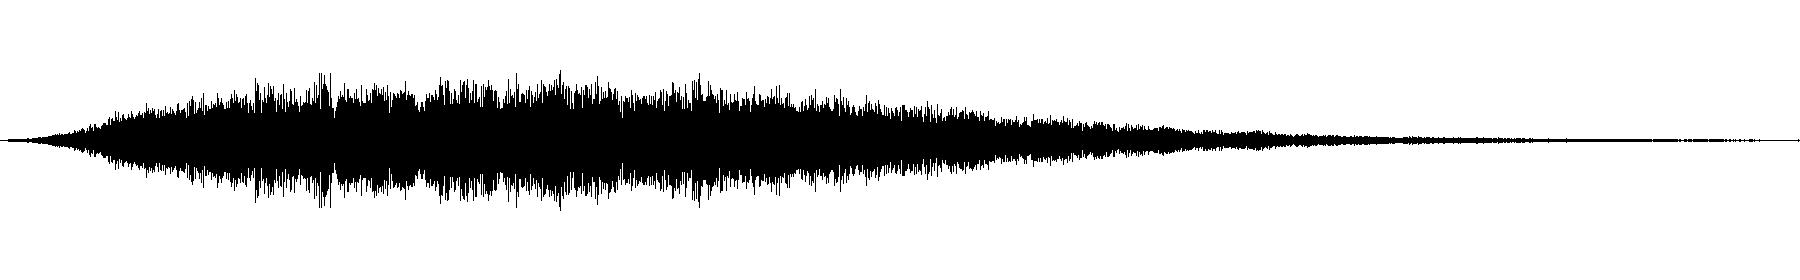 synth choir cm6